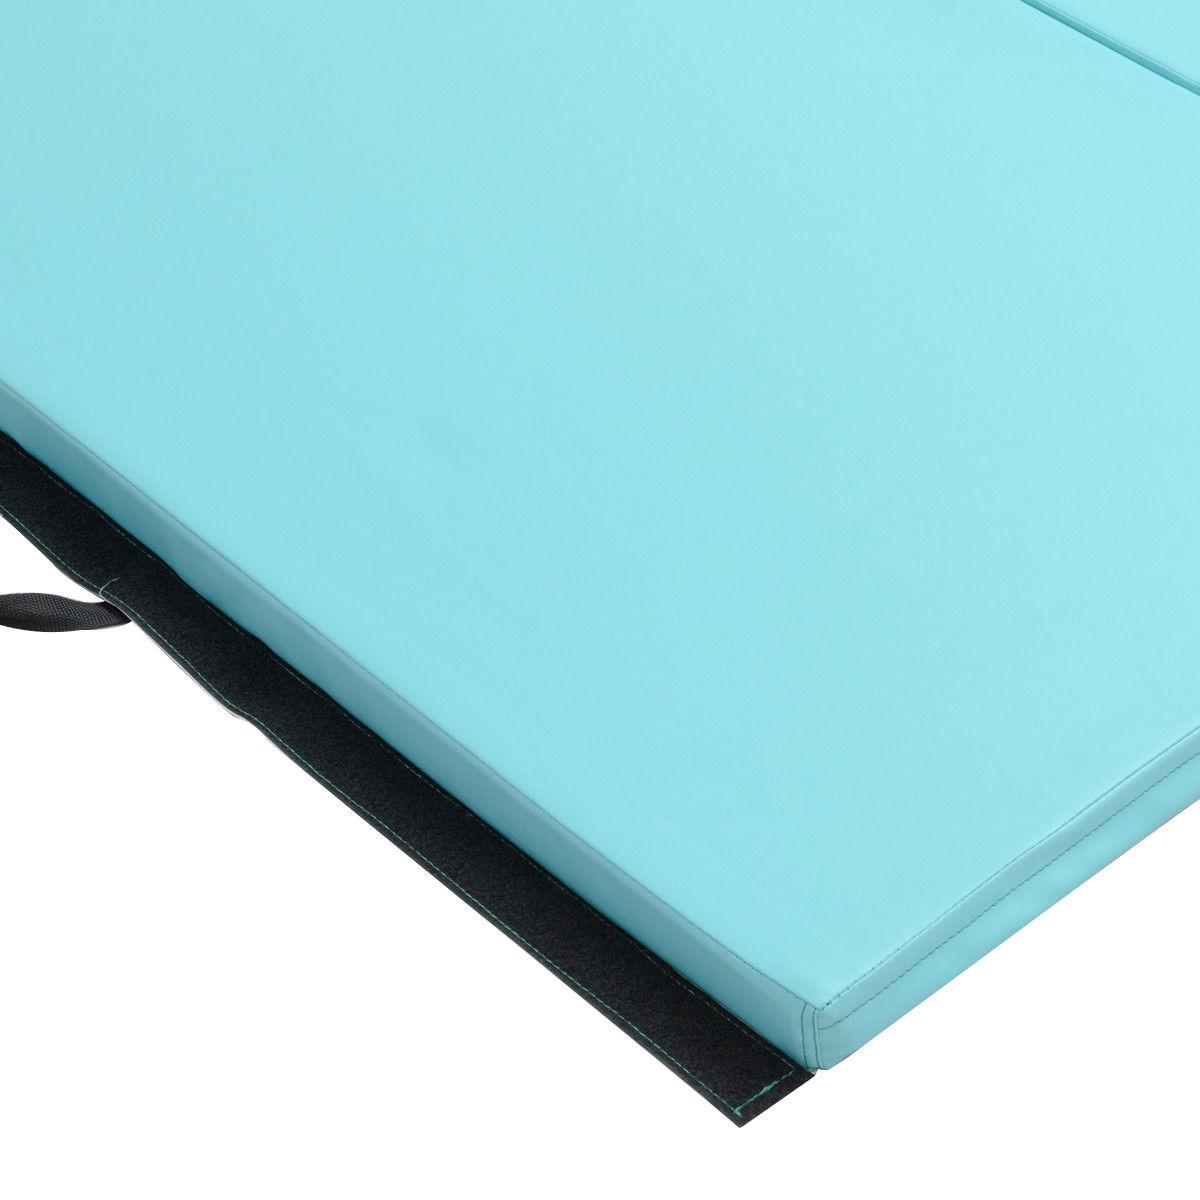 "4'x10'x2"" Gymnastics Mat Thick Folding Panel Aerobics Exercise Gym Fitness Blue - image 4 de 8"